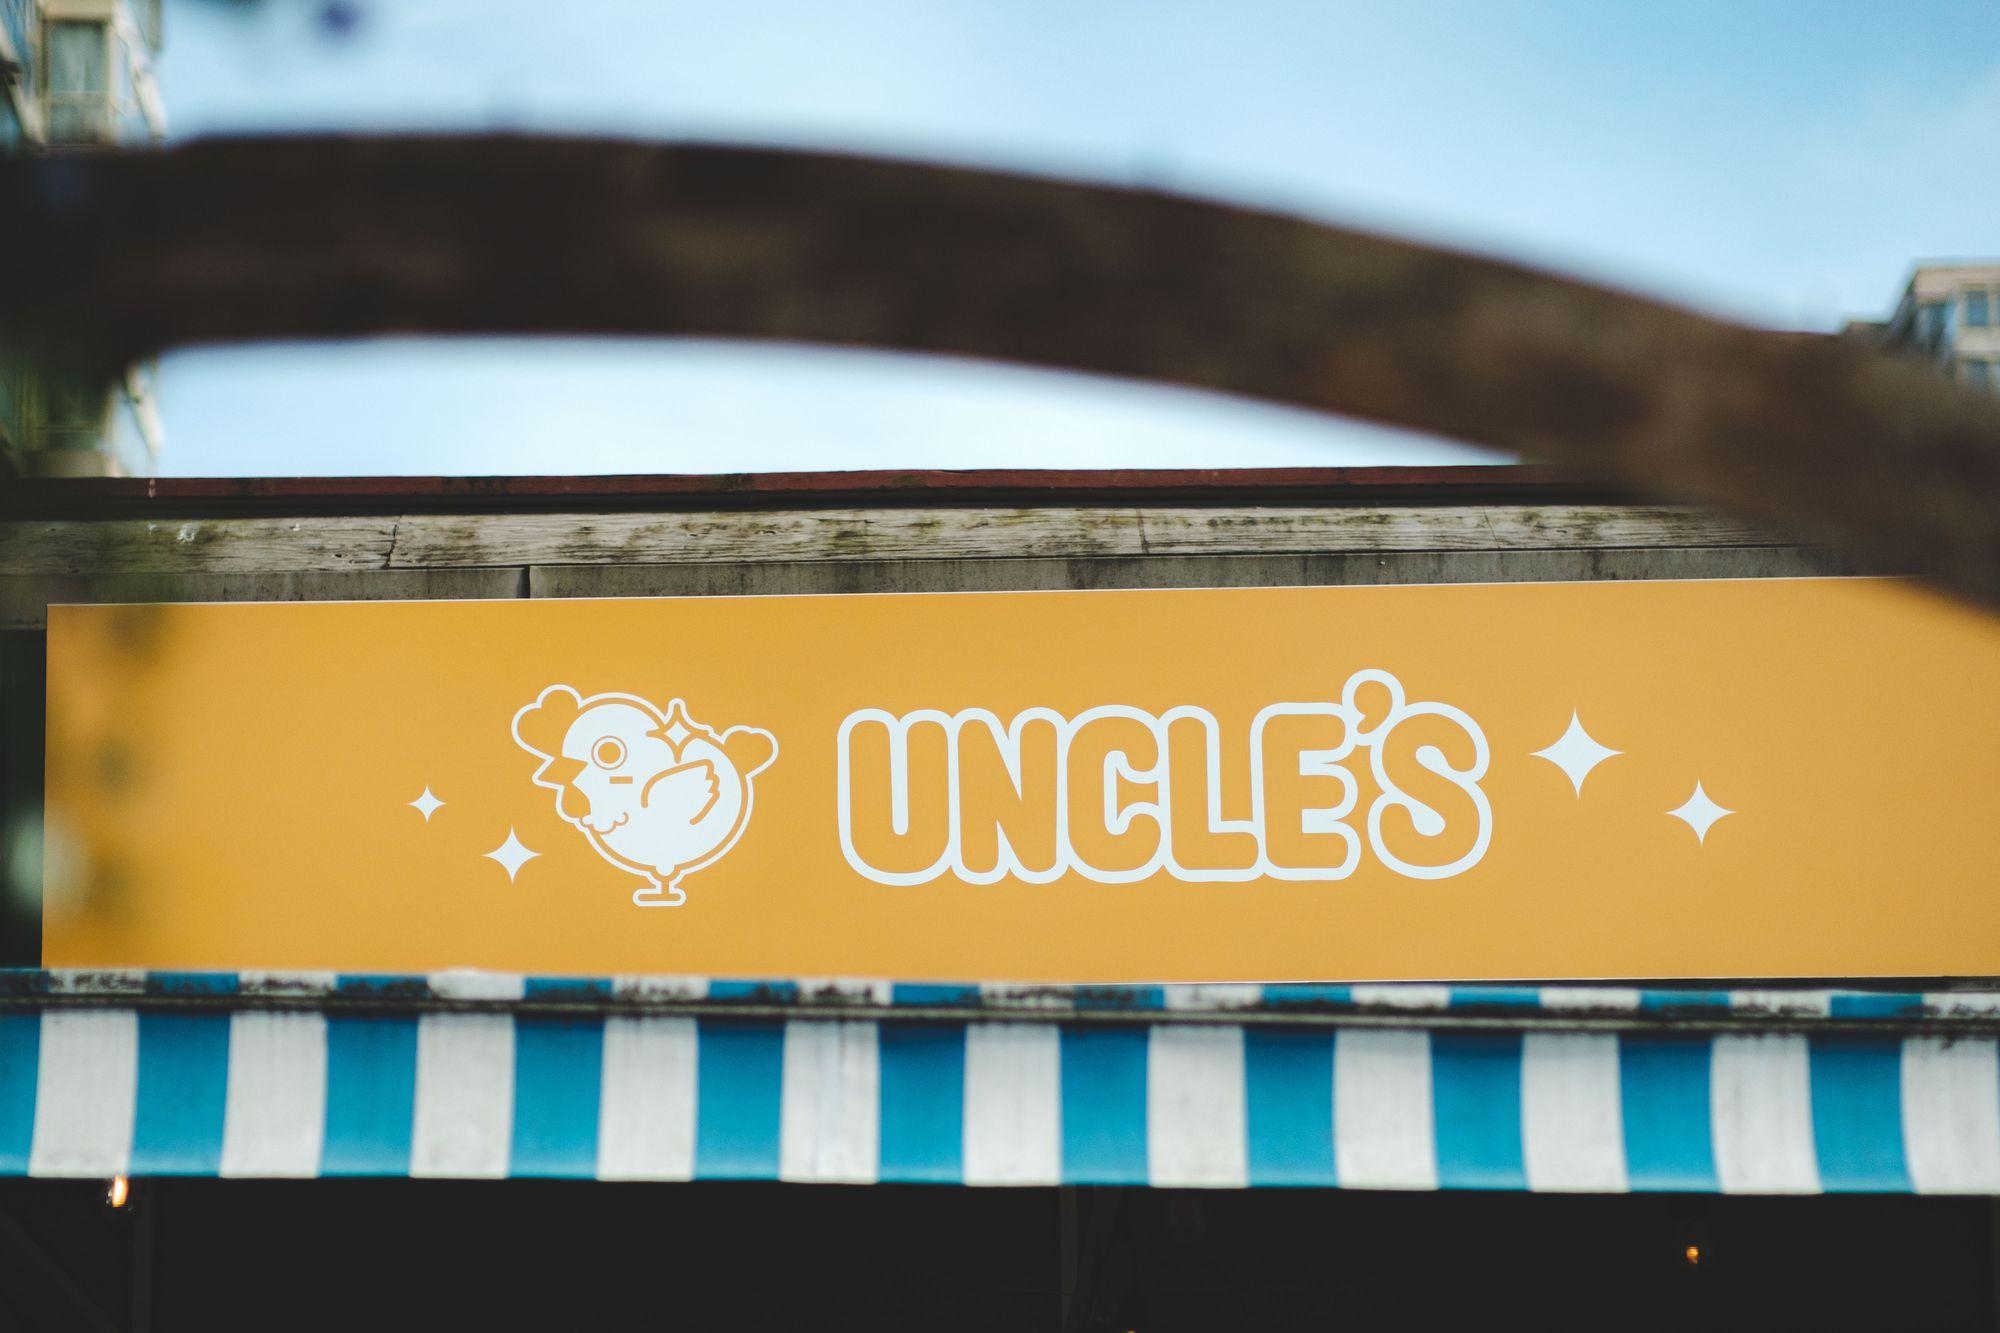 Uncle's Signage